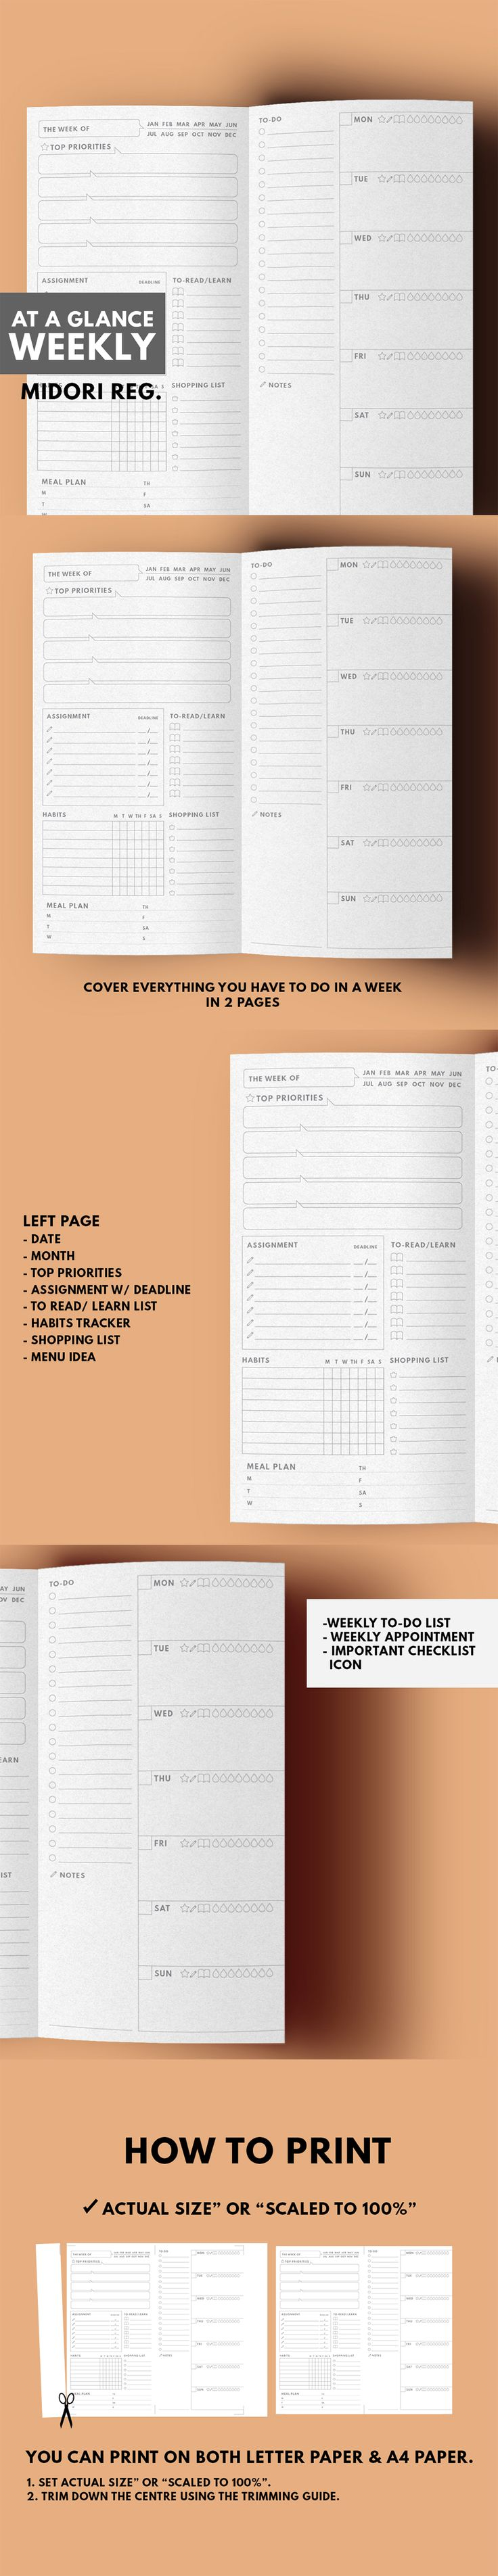 Idée de mise en page semaine. (Midori Traveller's notebook Regular size Printable)